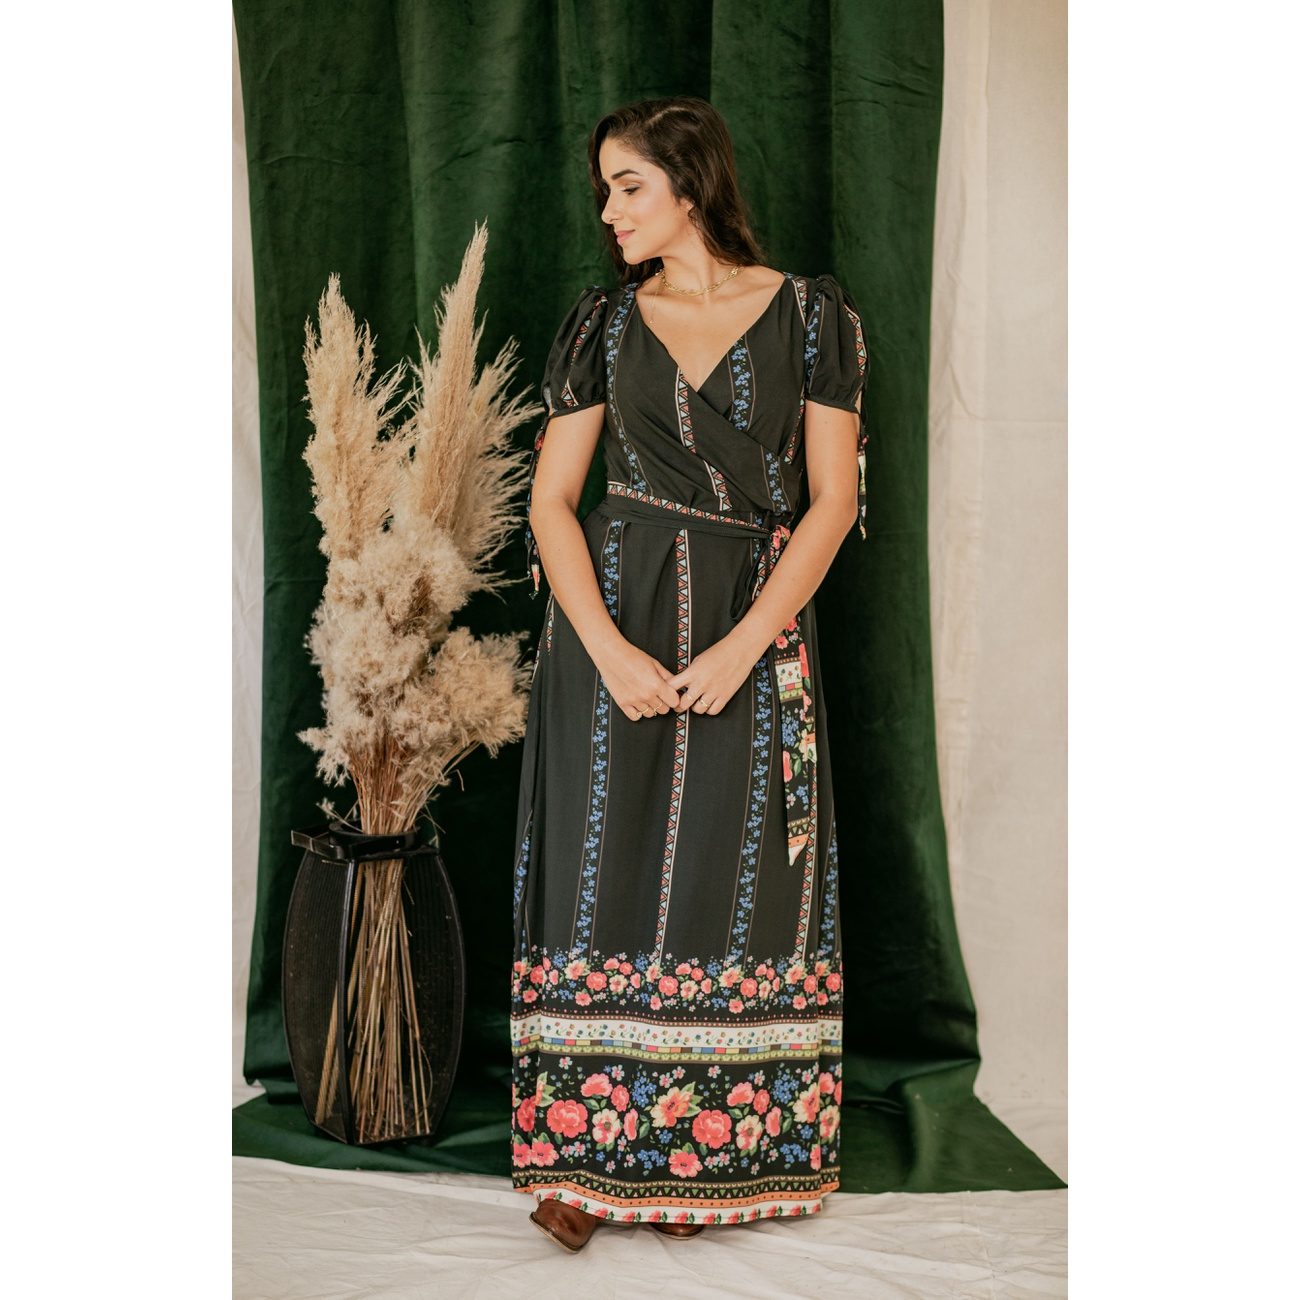 Vestido Monaliza - Jayane Picanço